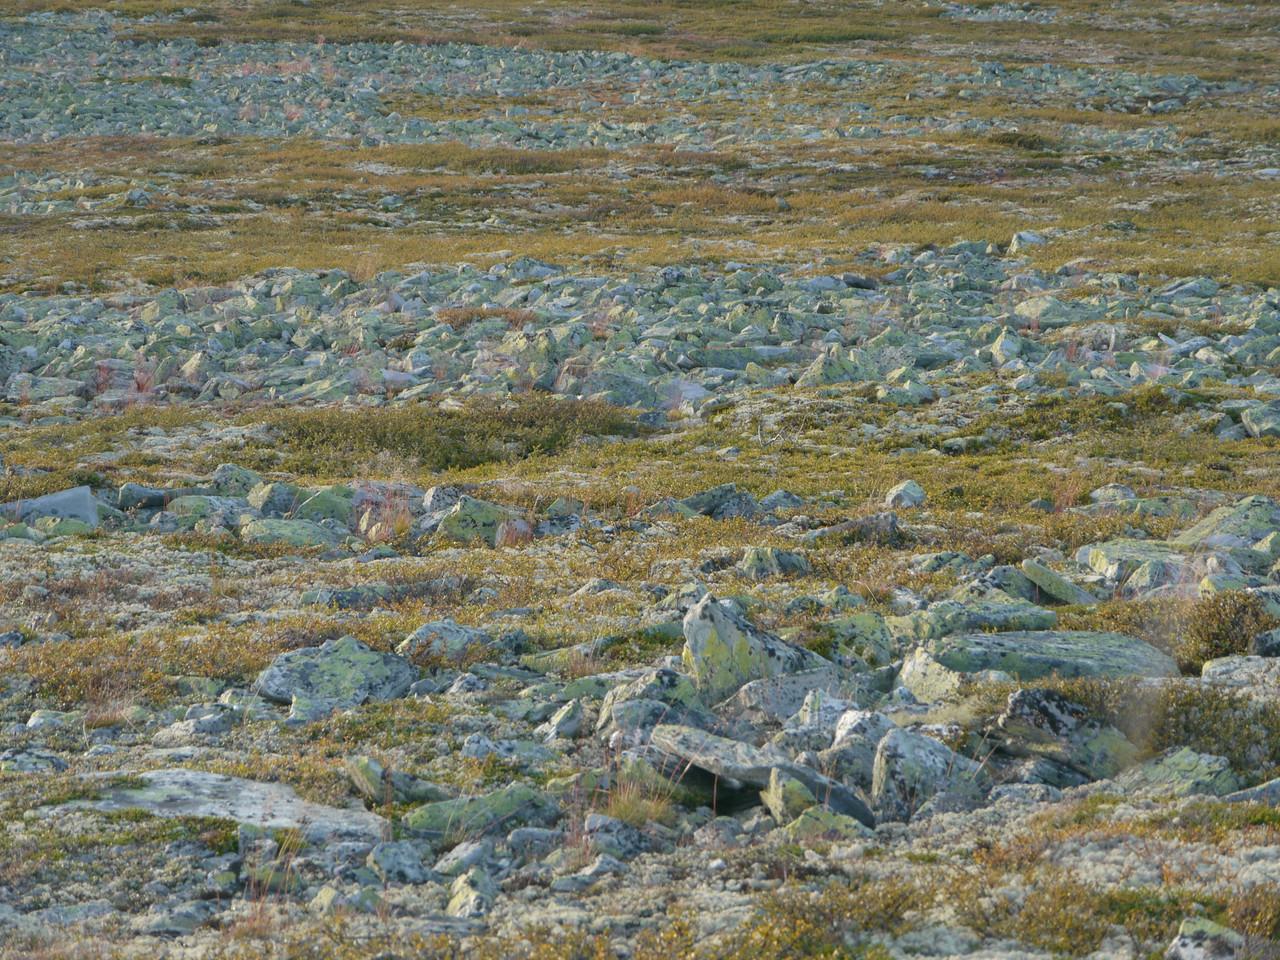 @RobAng 2012 / Brettninga, Friies-Weg von Ringebu nach Atna, Oppland, NOR, Norwegen, 1187 m ü/M, 03.09.2012 19:06:01